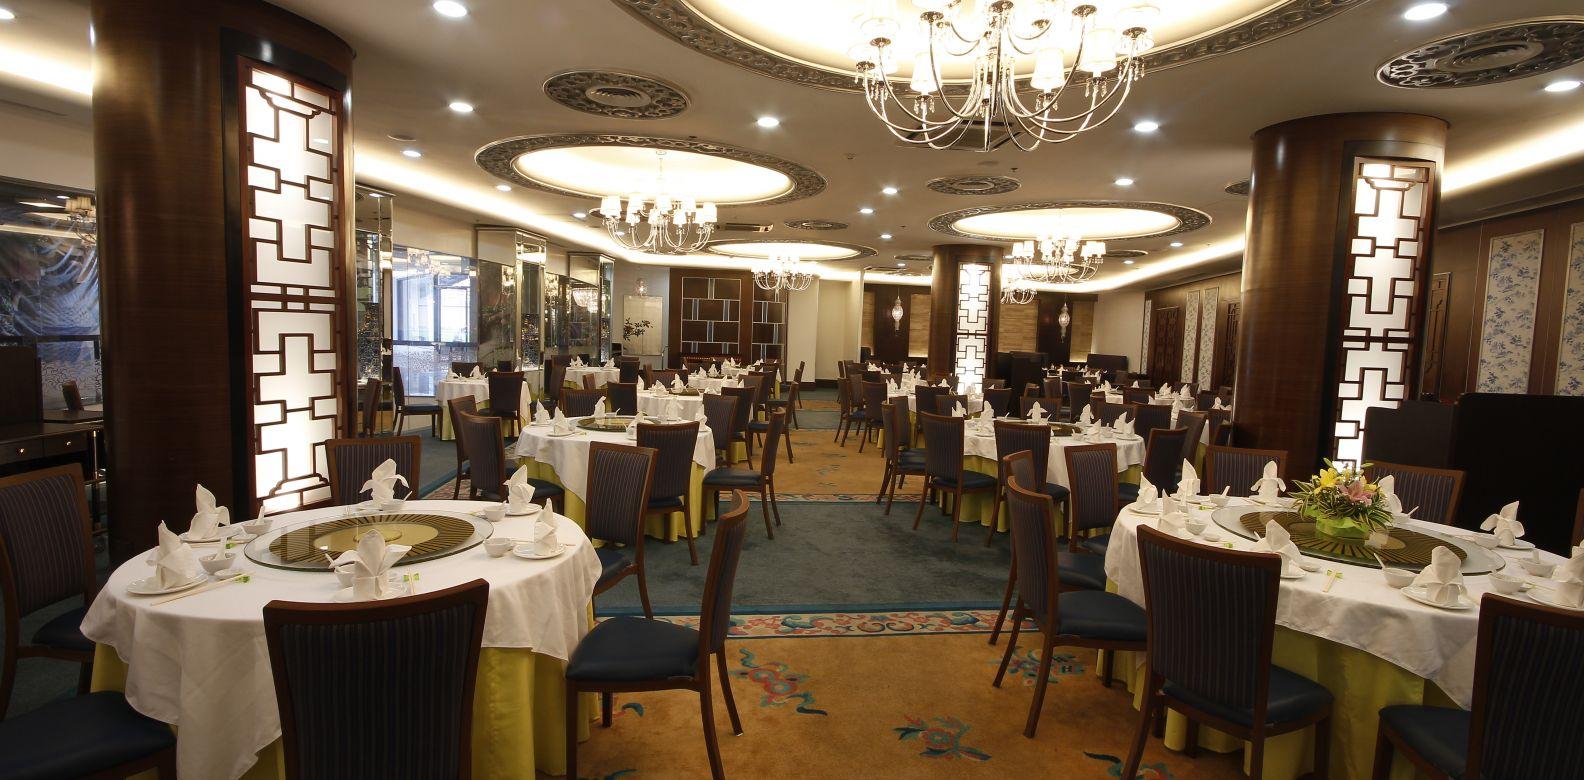 Peking garden philippine tatler - New peking restaurant garden city ...